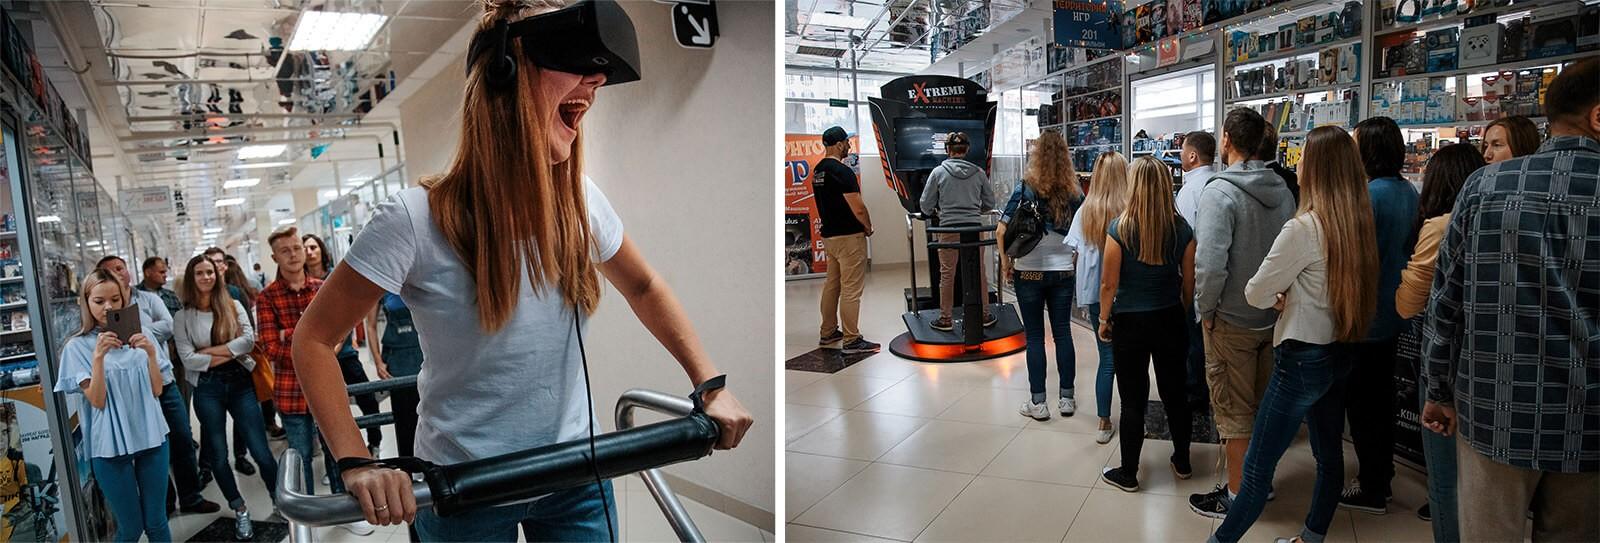 Автономные аттракционы для аркадных зон и VR парков X-Machine и X-Bike